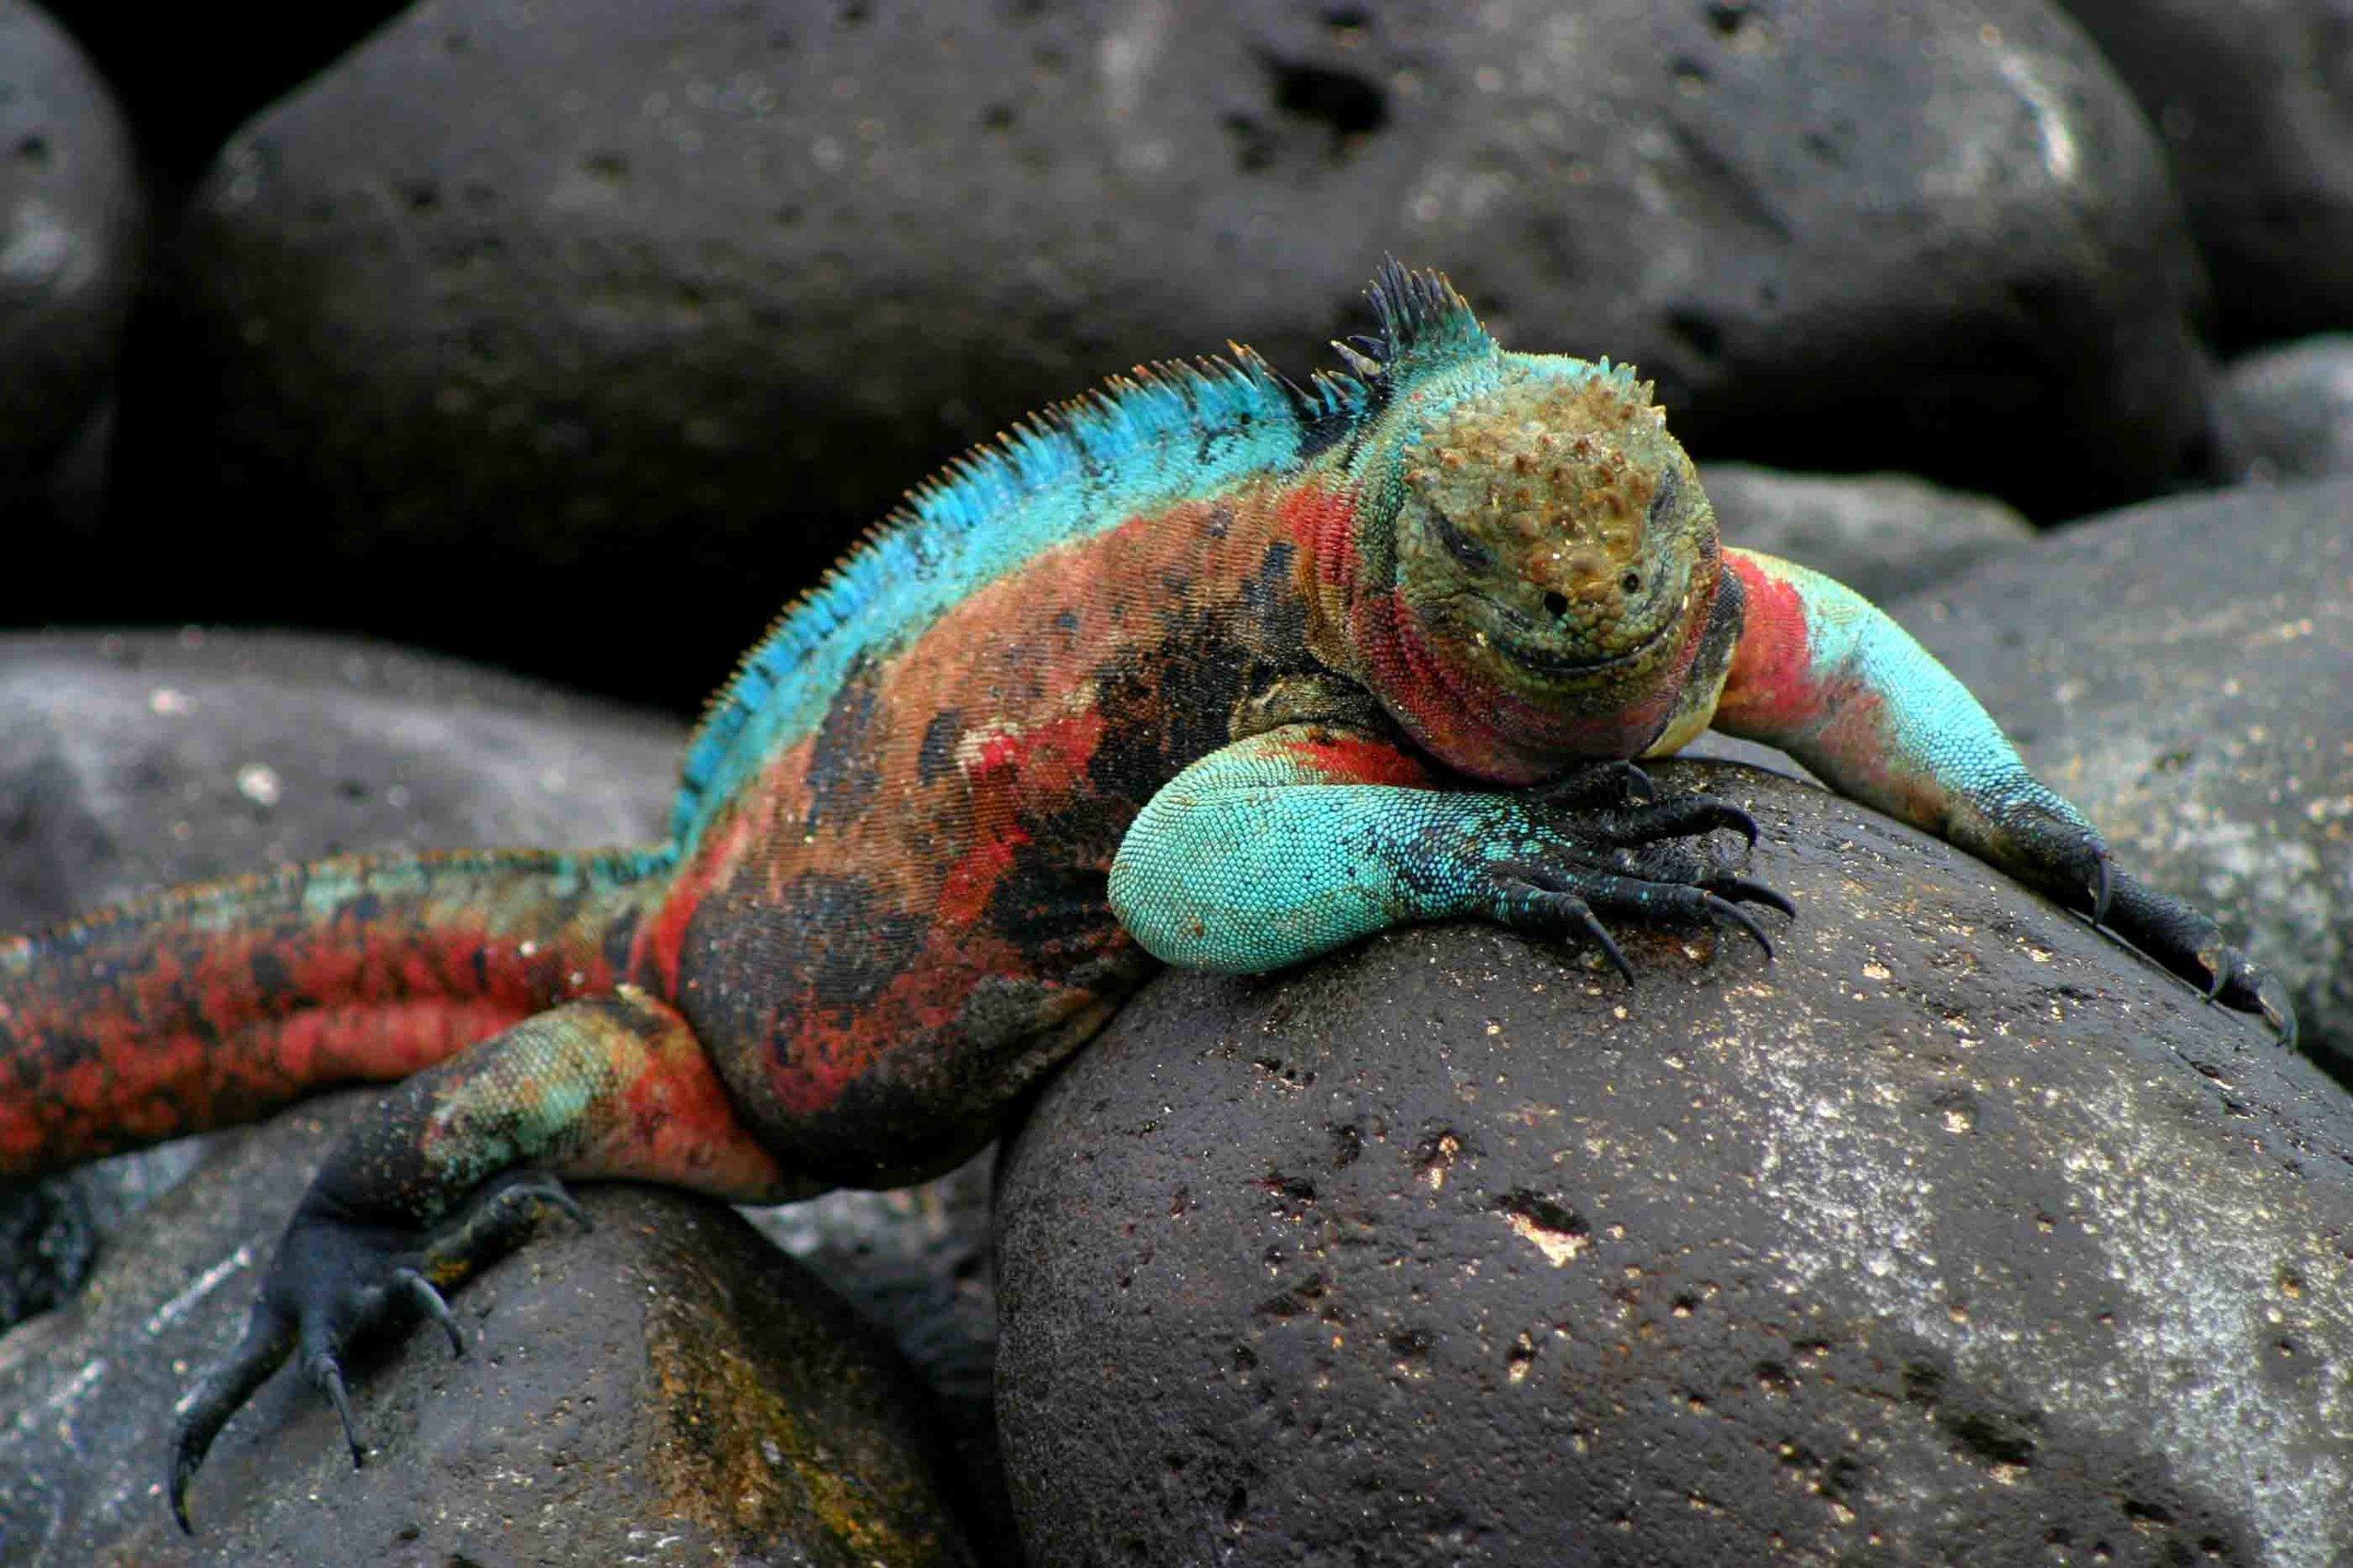 Marine-iguana-Galapagos-islands.jpg